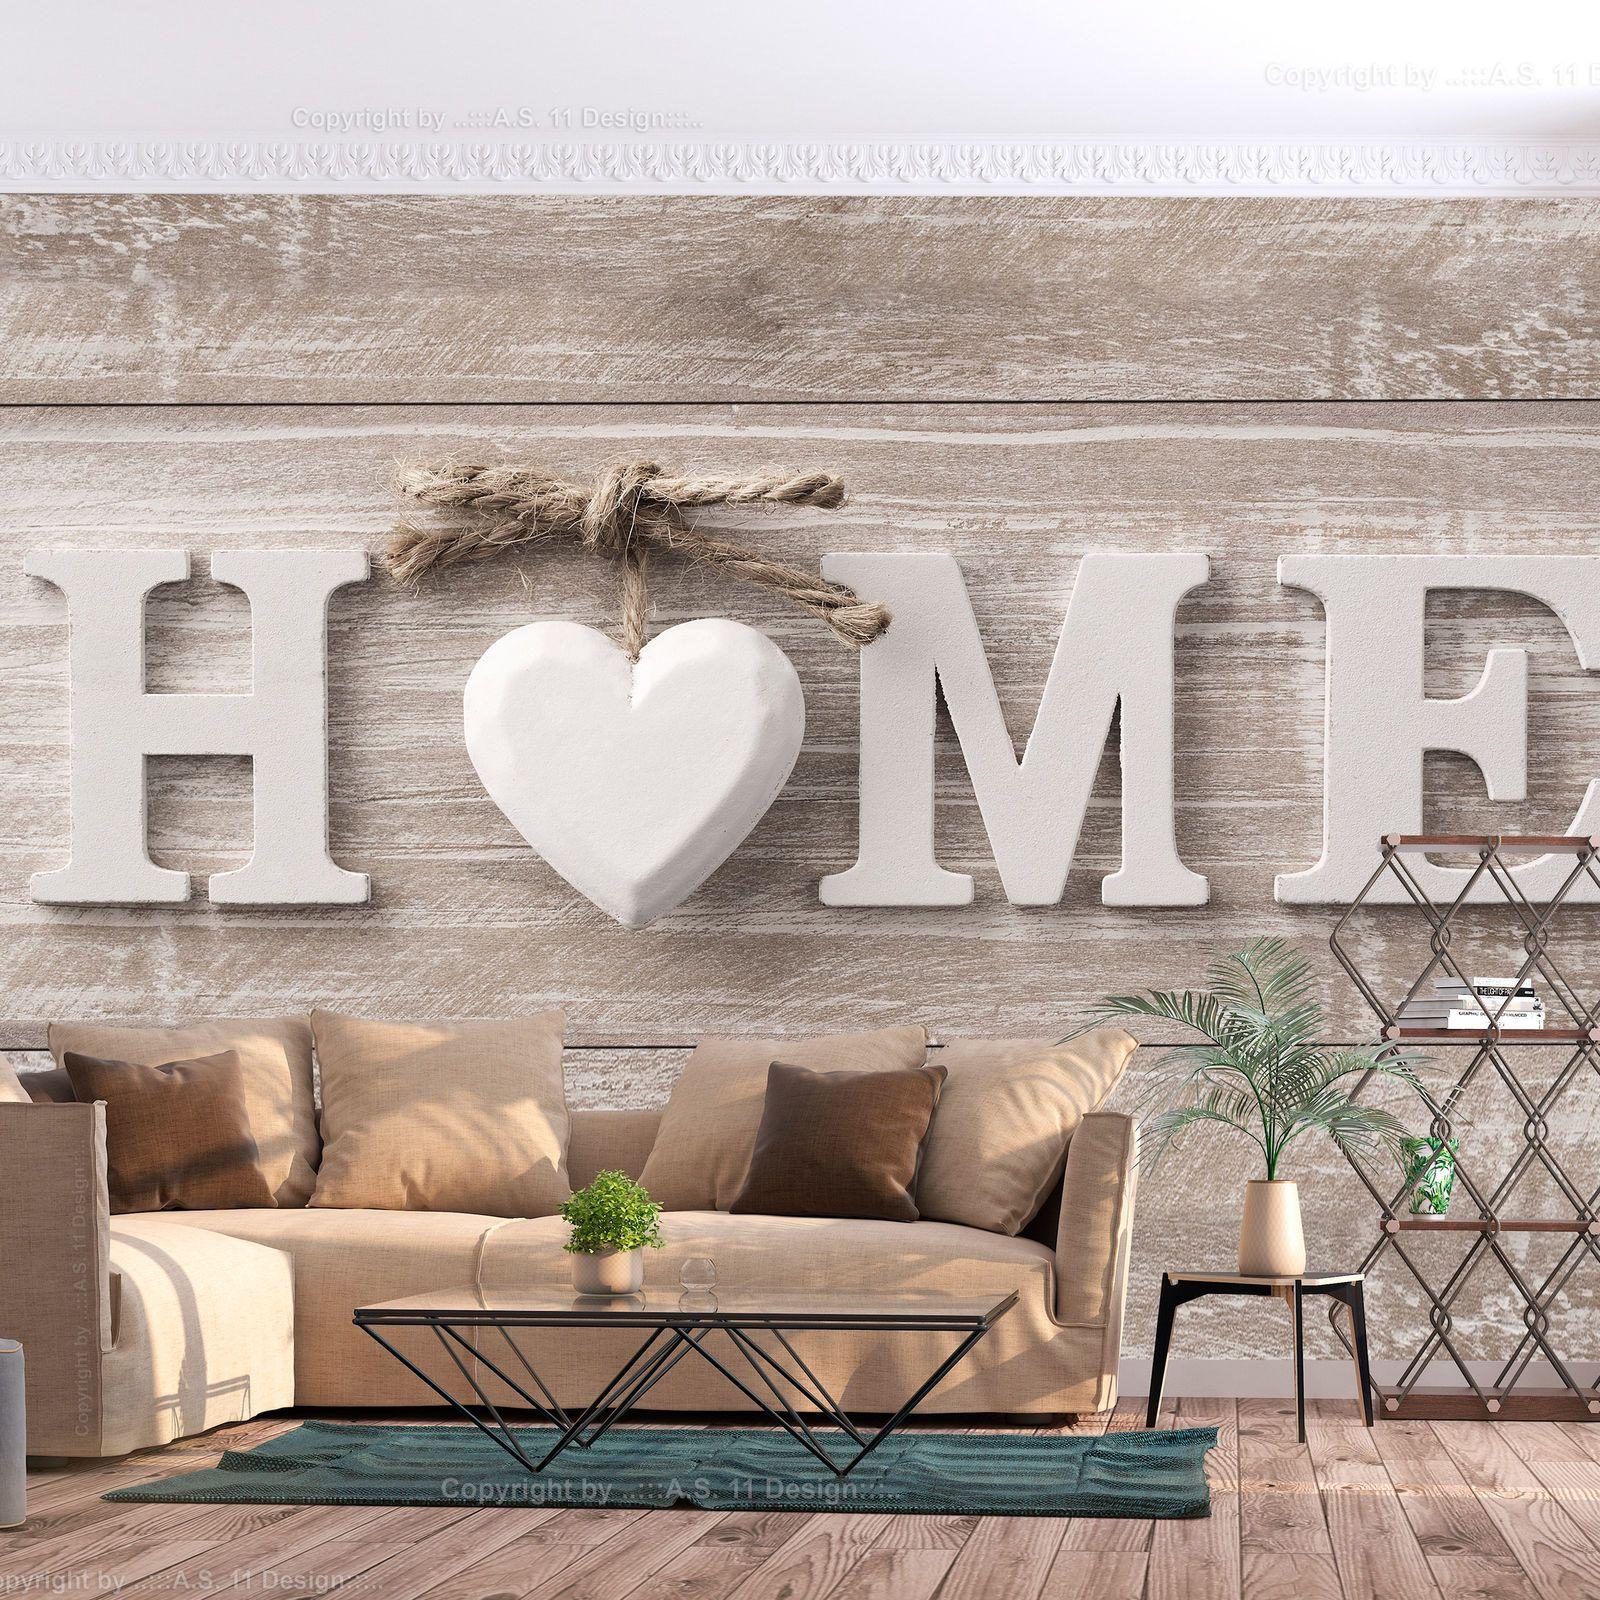 VLIES Fototapete Schlafzimmer Home Holz Optik Herz Scandi Tapete  M B 0034 A A   EUR